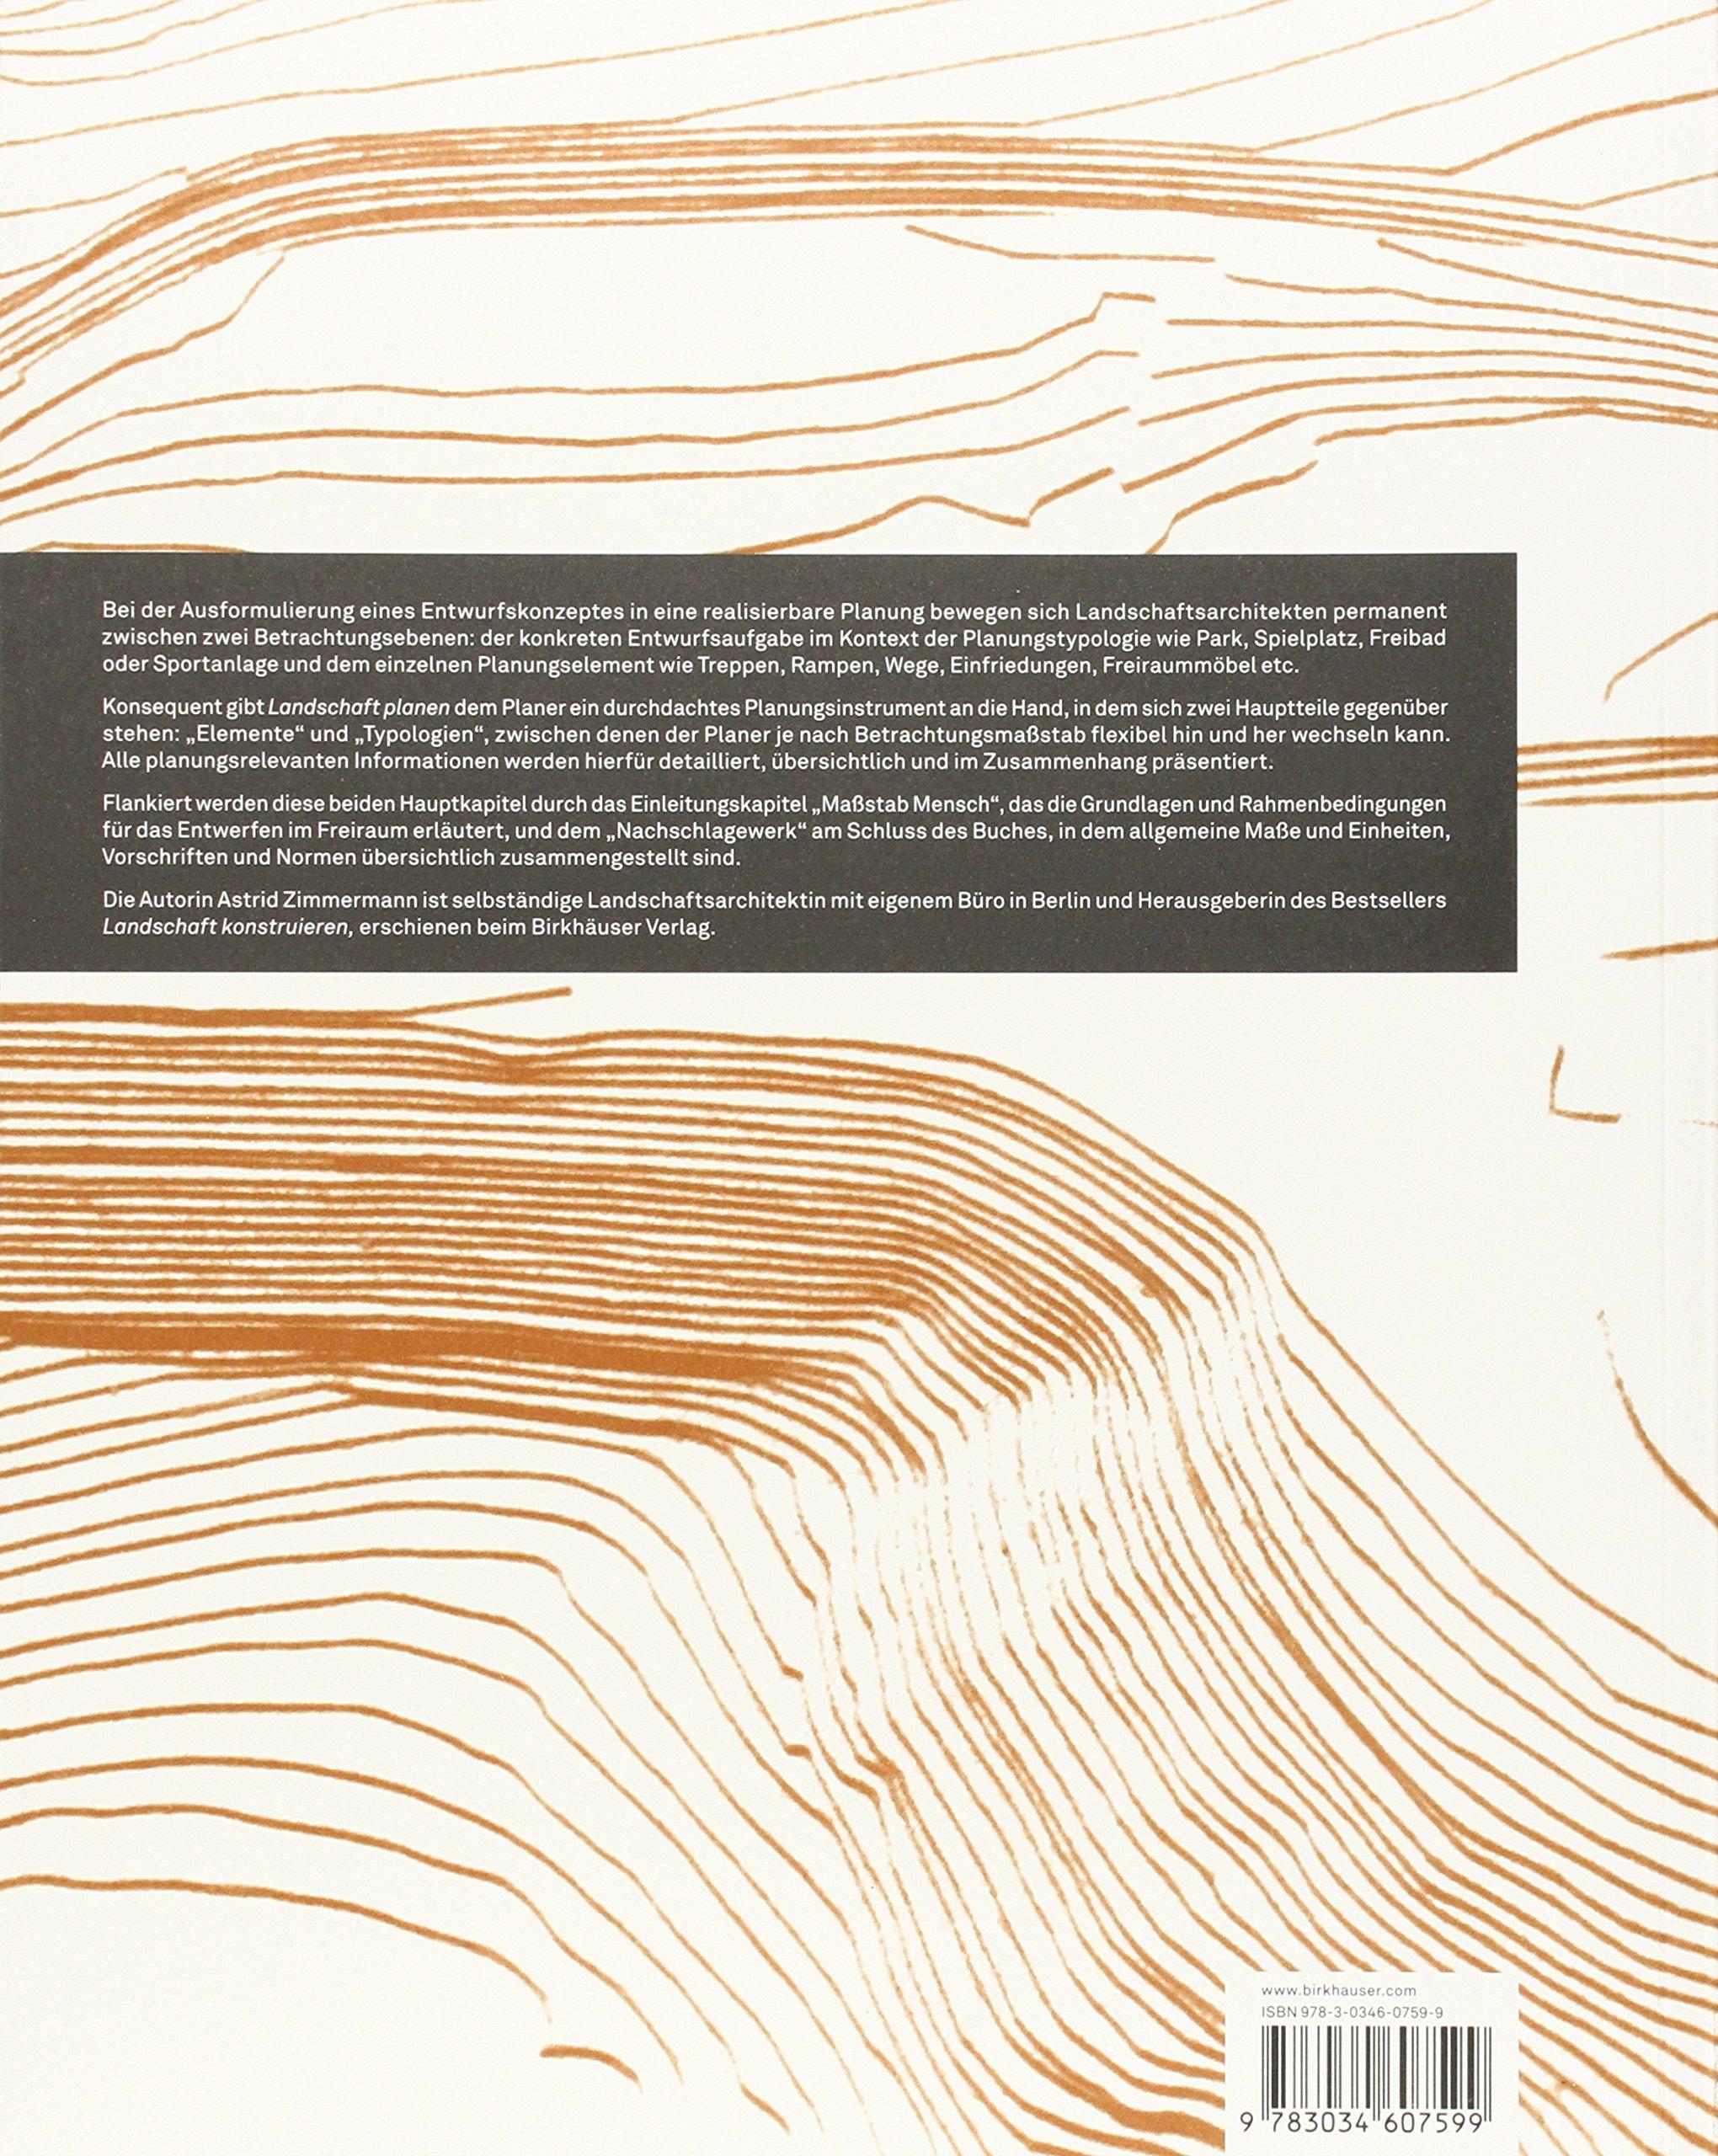 Treppe Planen landschaft planen dimensionen elemente typologien amazon de